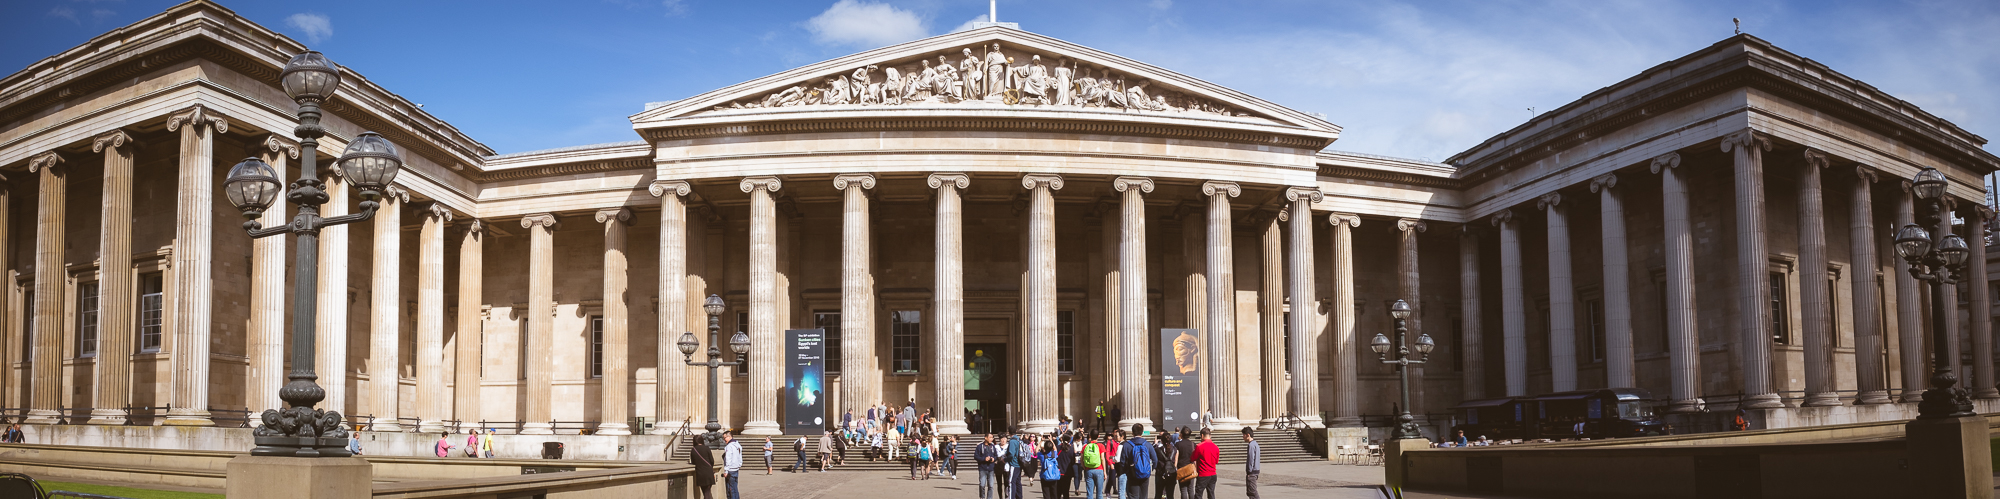 Entrada al British Museum.